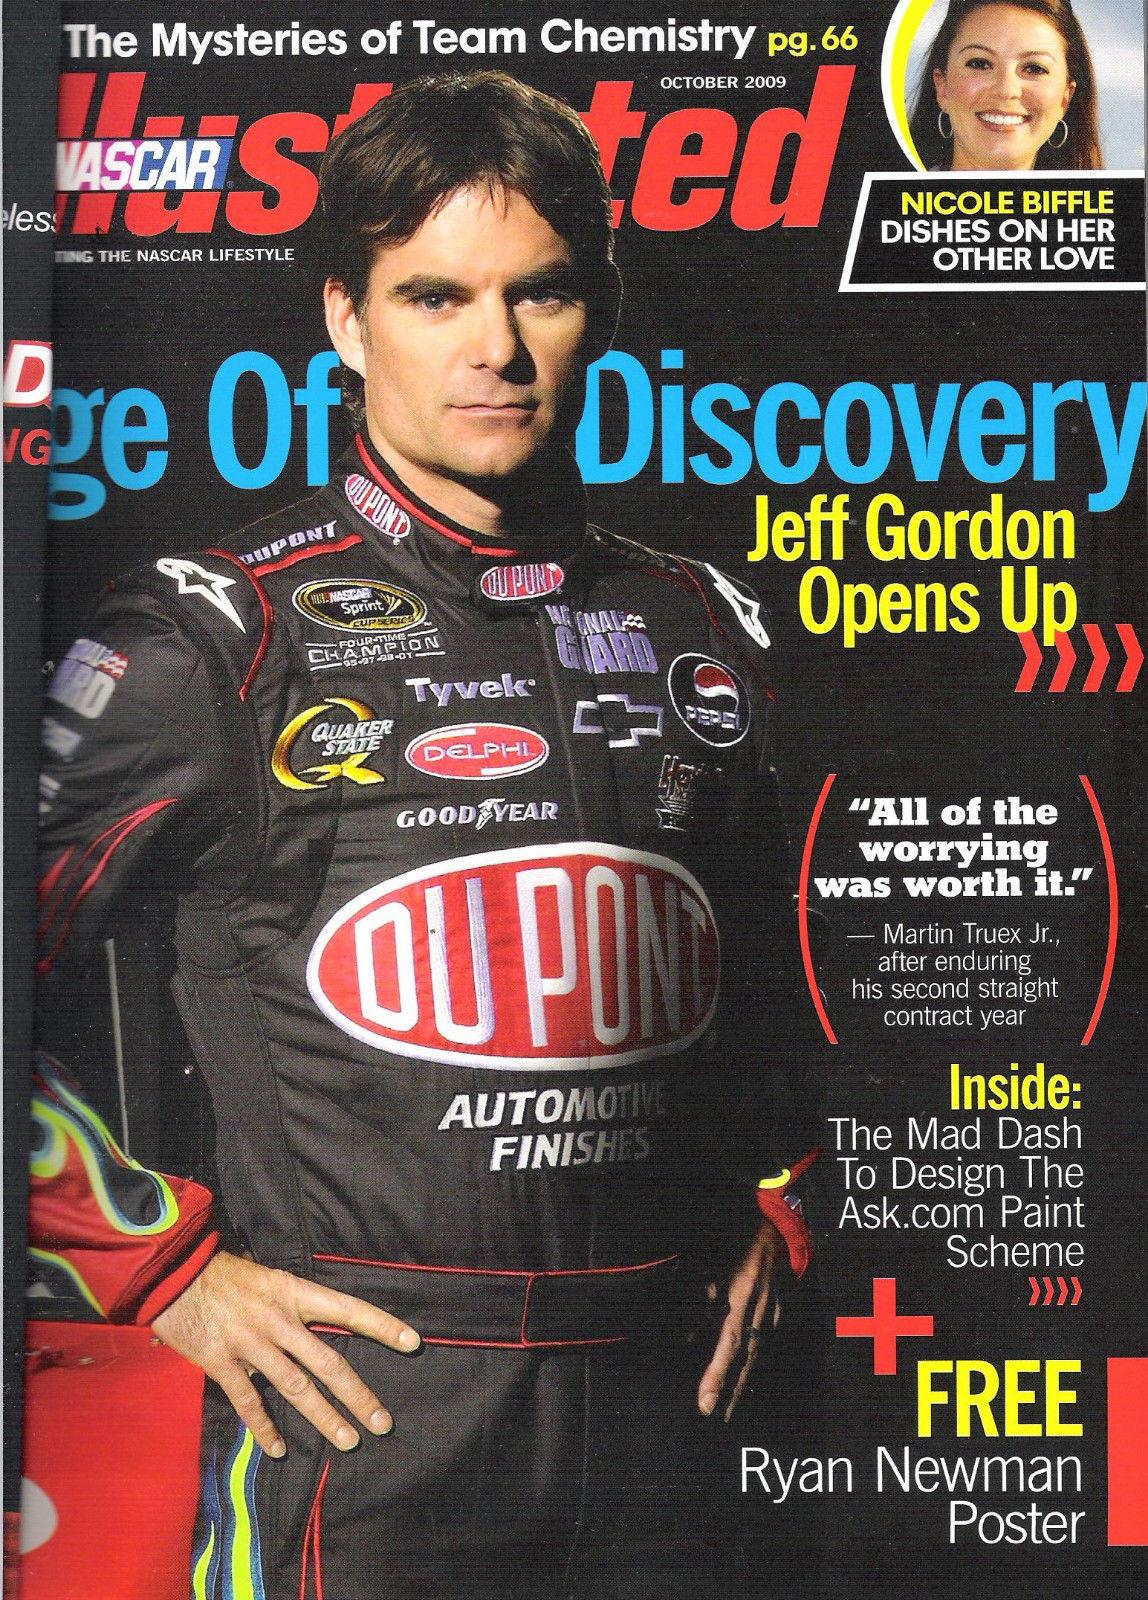 Nascar Illustrated October 2009 Verizon Jeff Gordon Opens Up Ryan Newman Poster image 2